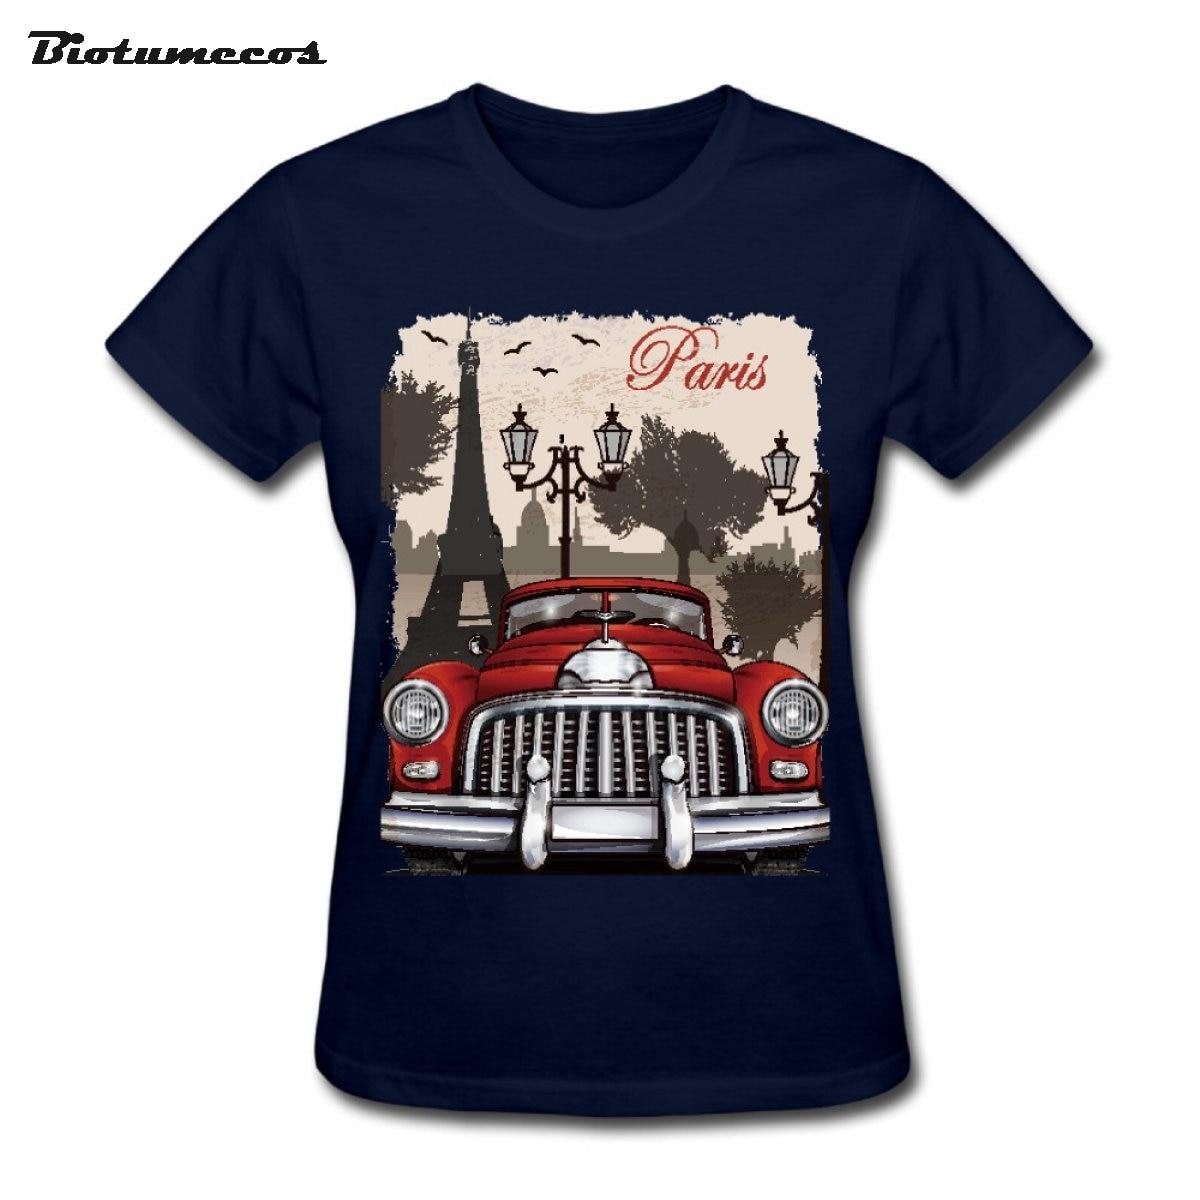 New design women t shirts paris tower of london bubble car for Promotional t shirt design